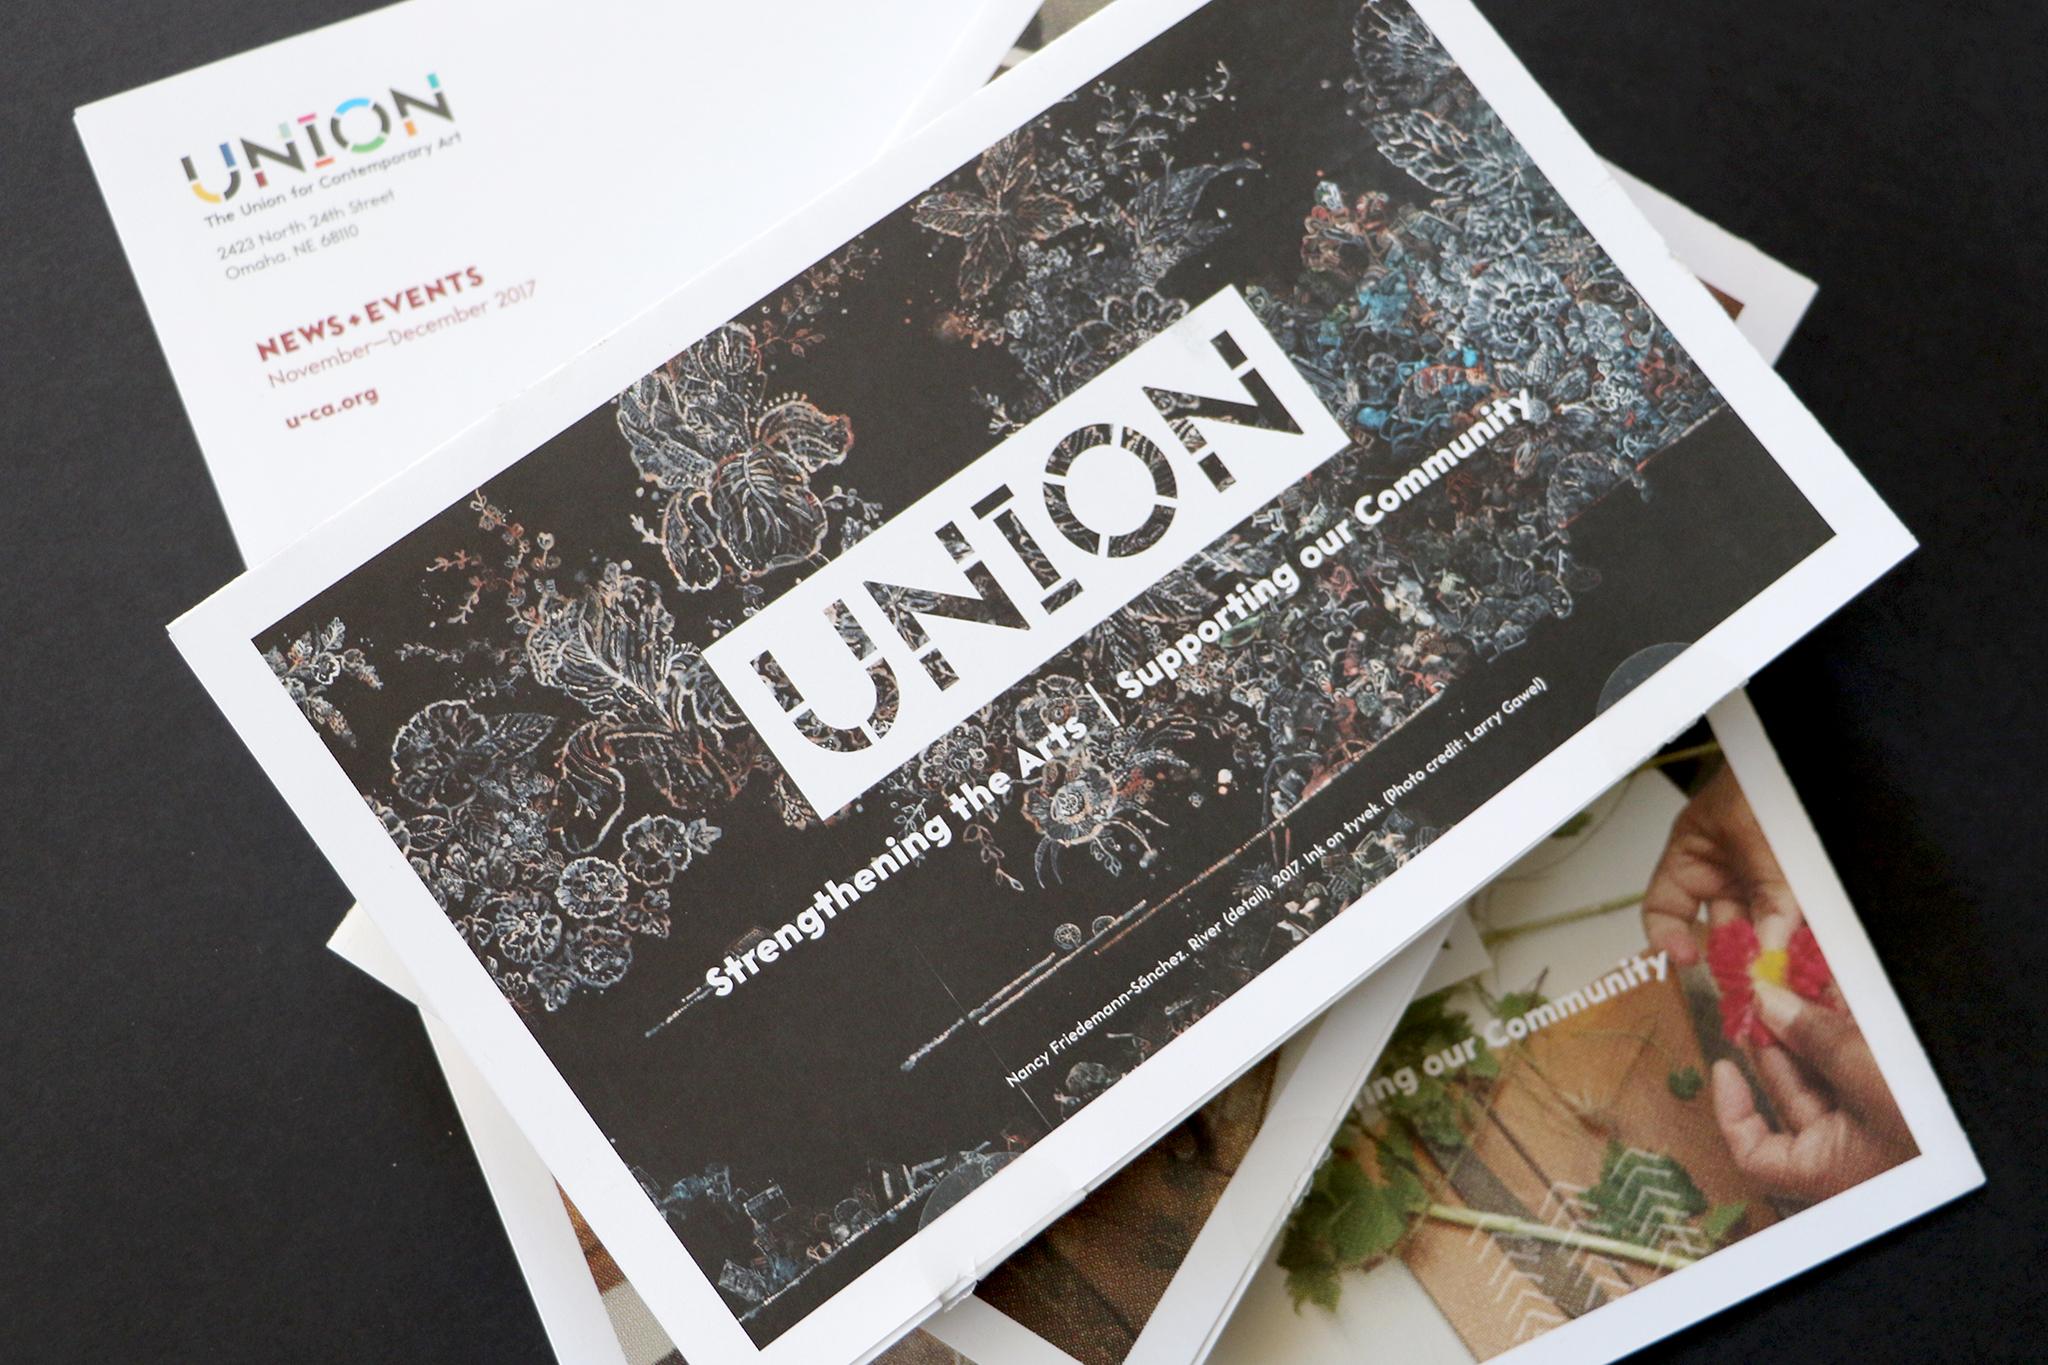 jkdc_union-newsletter-4.jpg